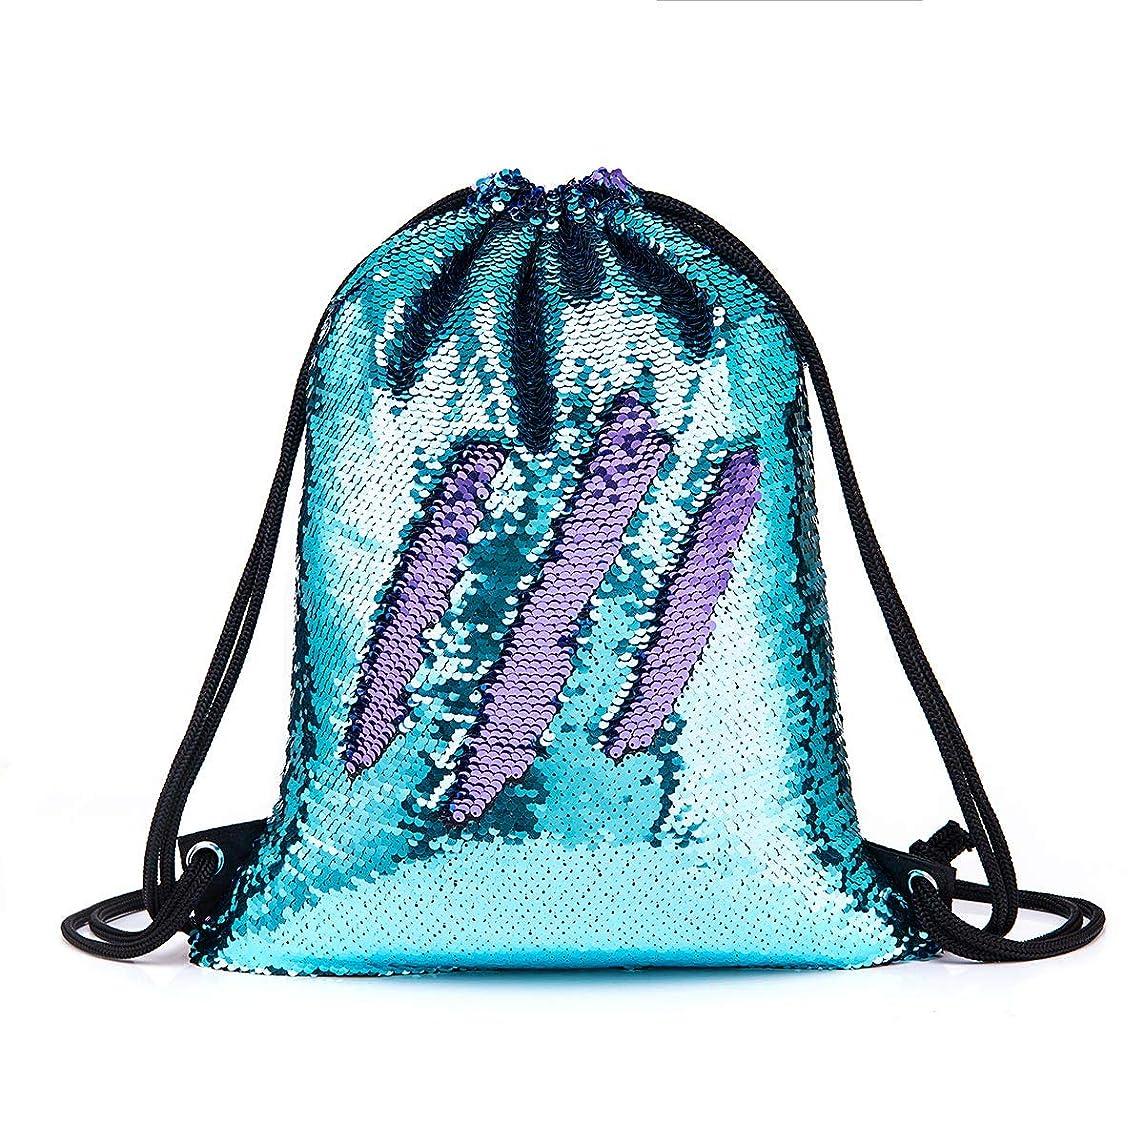 Morelegant Sequin Drawstring Backpack Mermaid Glittering Gym Camping Hiking Dance Party Shoulder Sling Bag Casual Daypack Gifts for Kids Girls?Boys Women